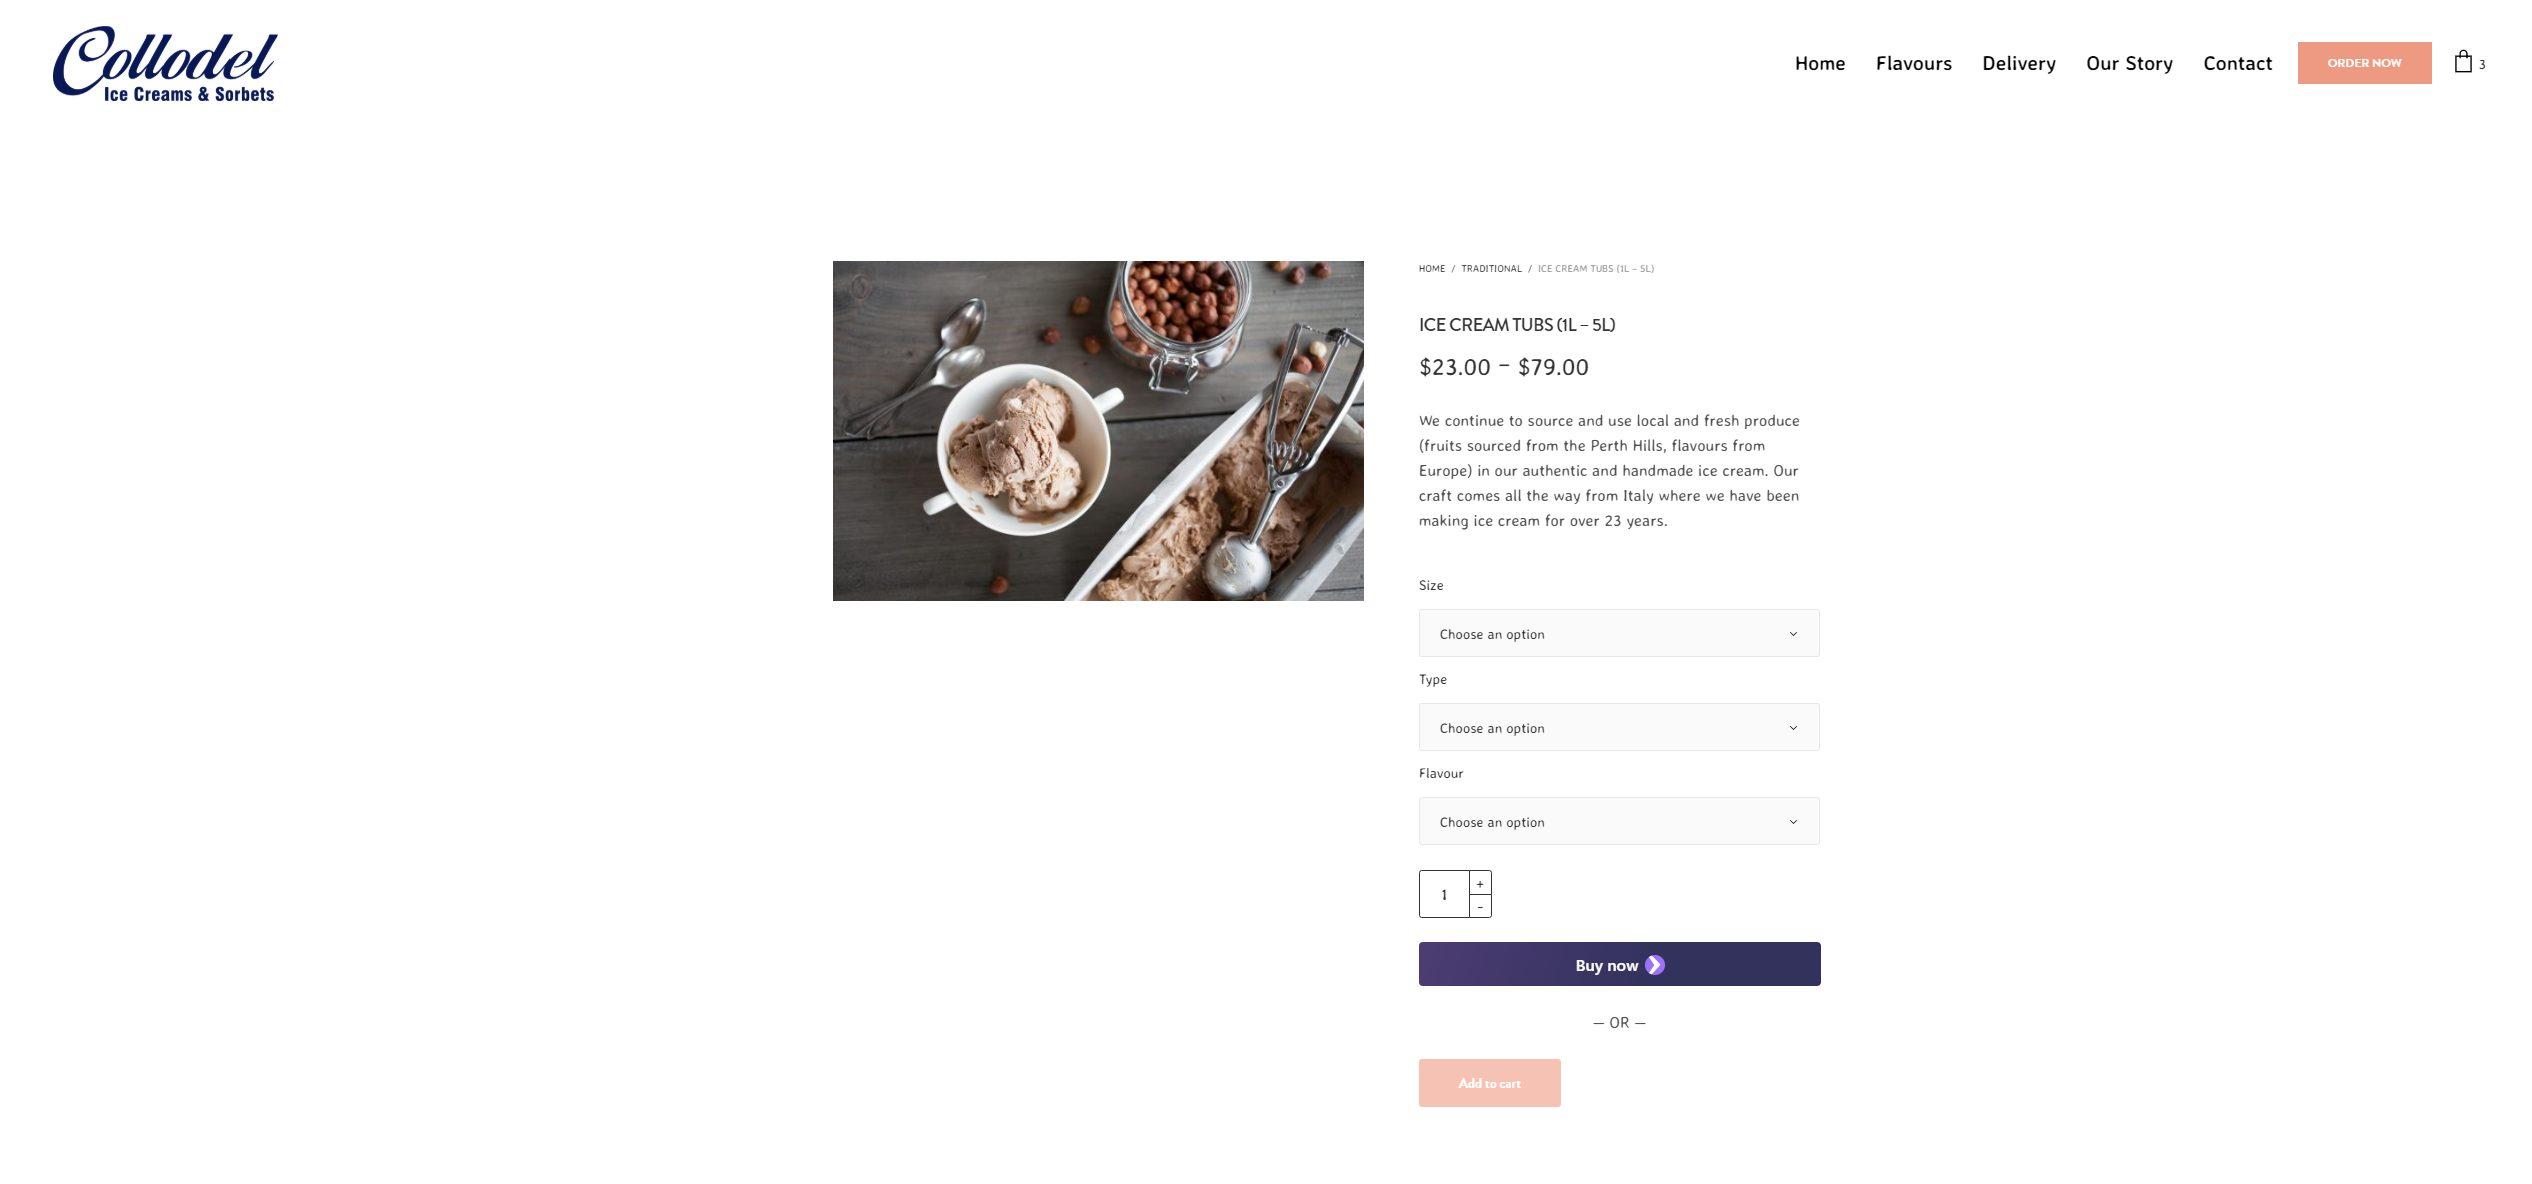 Collodel Ice Cream Sorbets - Kalamunda Perth - Bray Marketing Website - Order